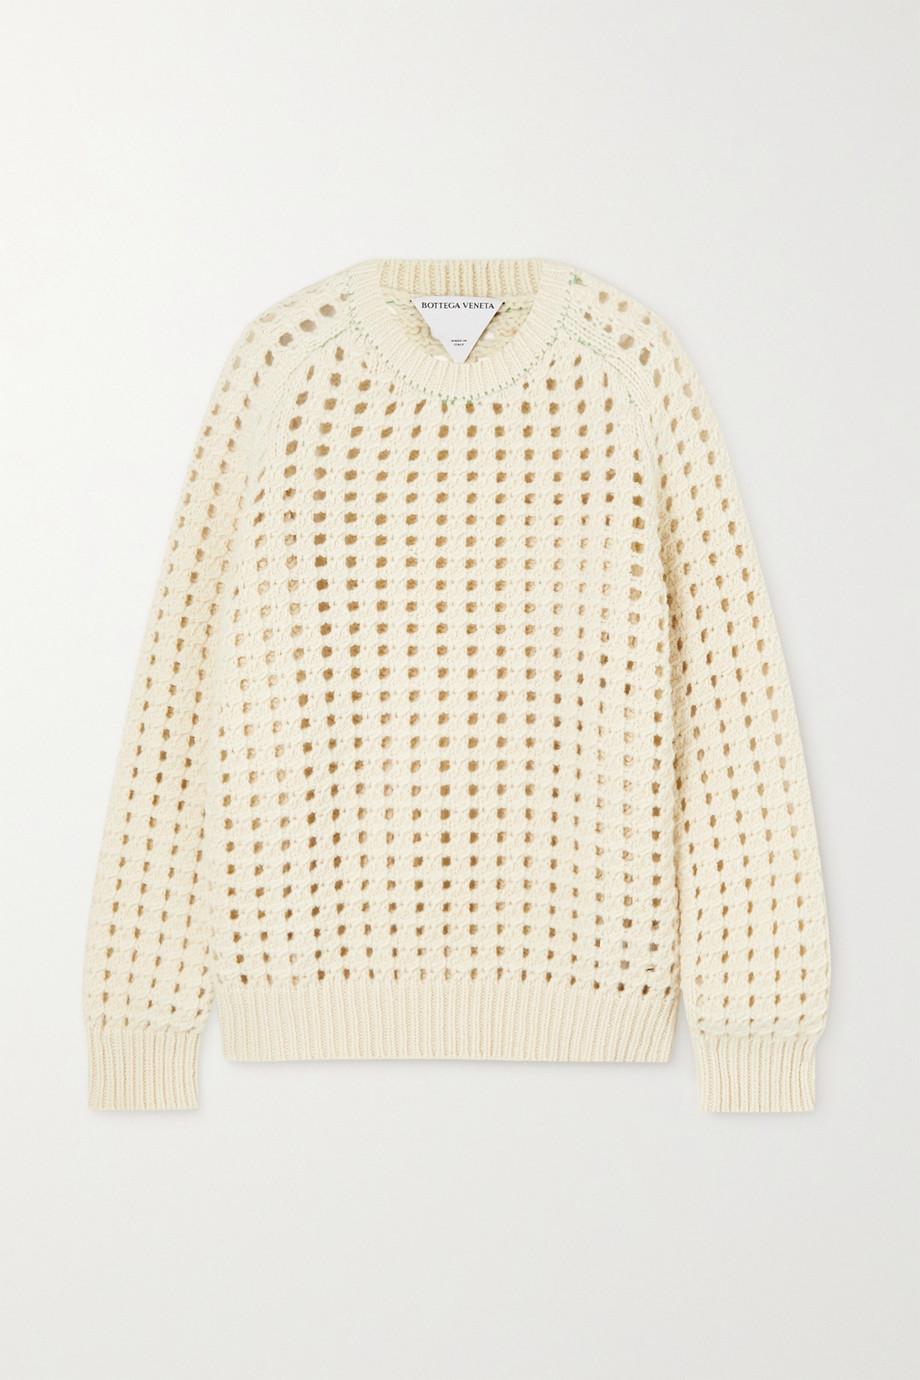 Bottega Veneta Open-knit wool sweater